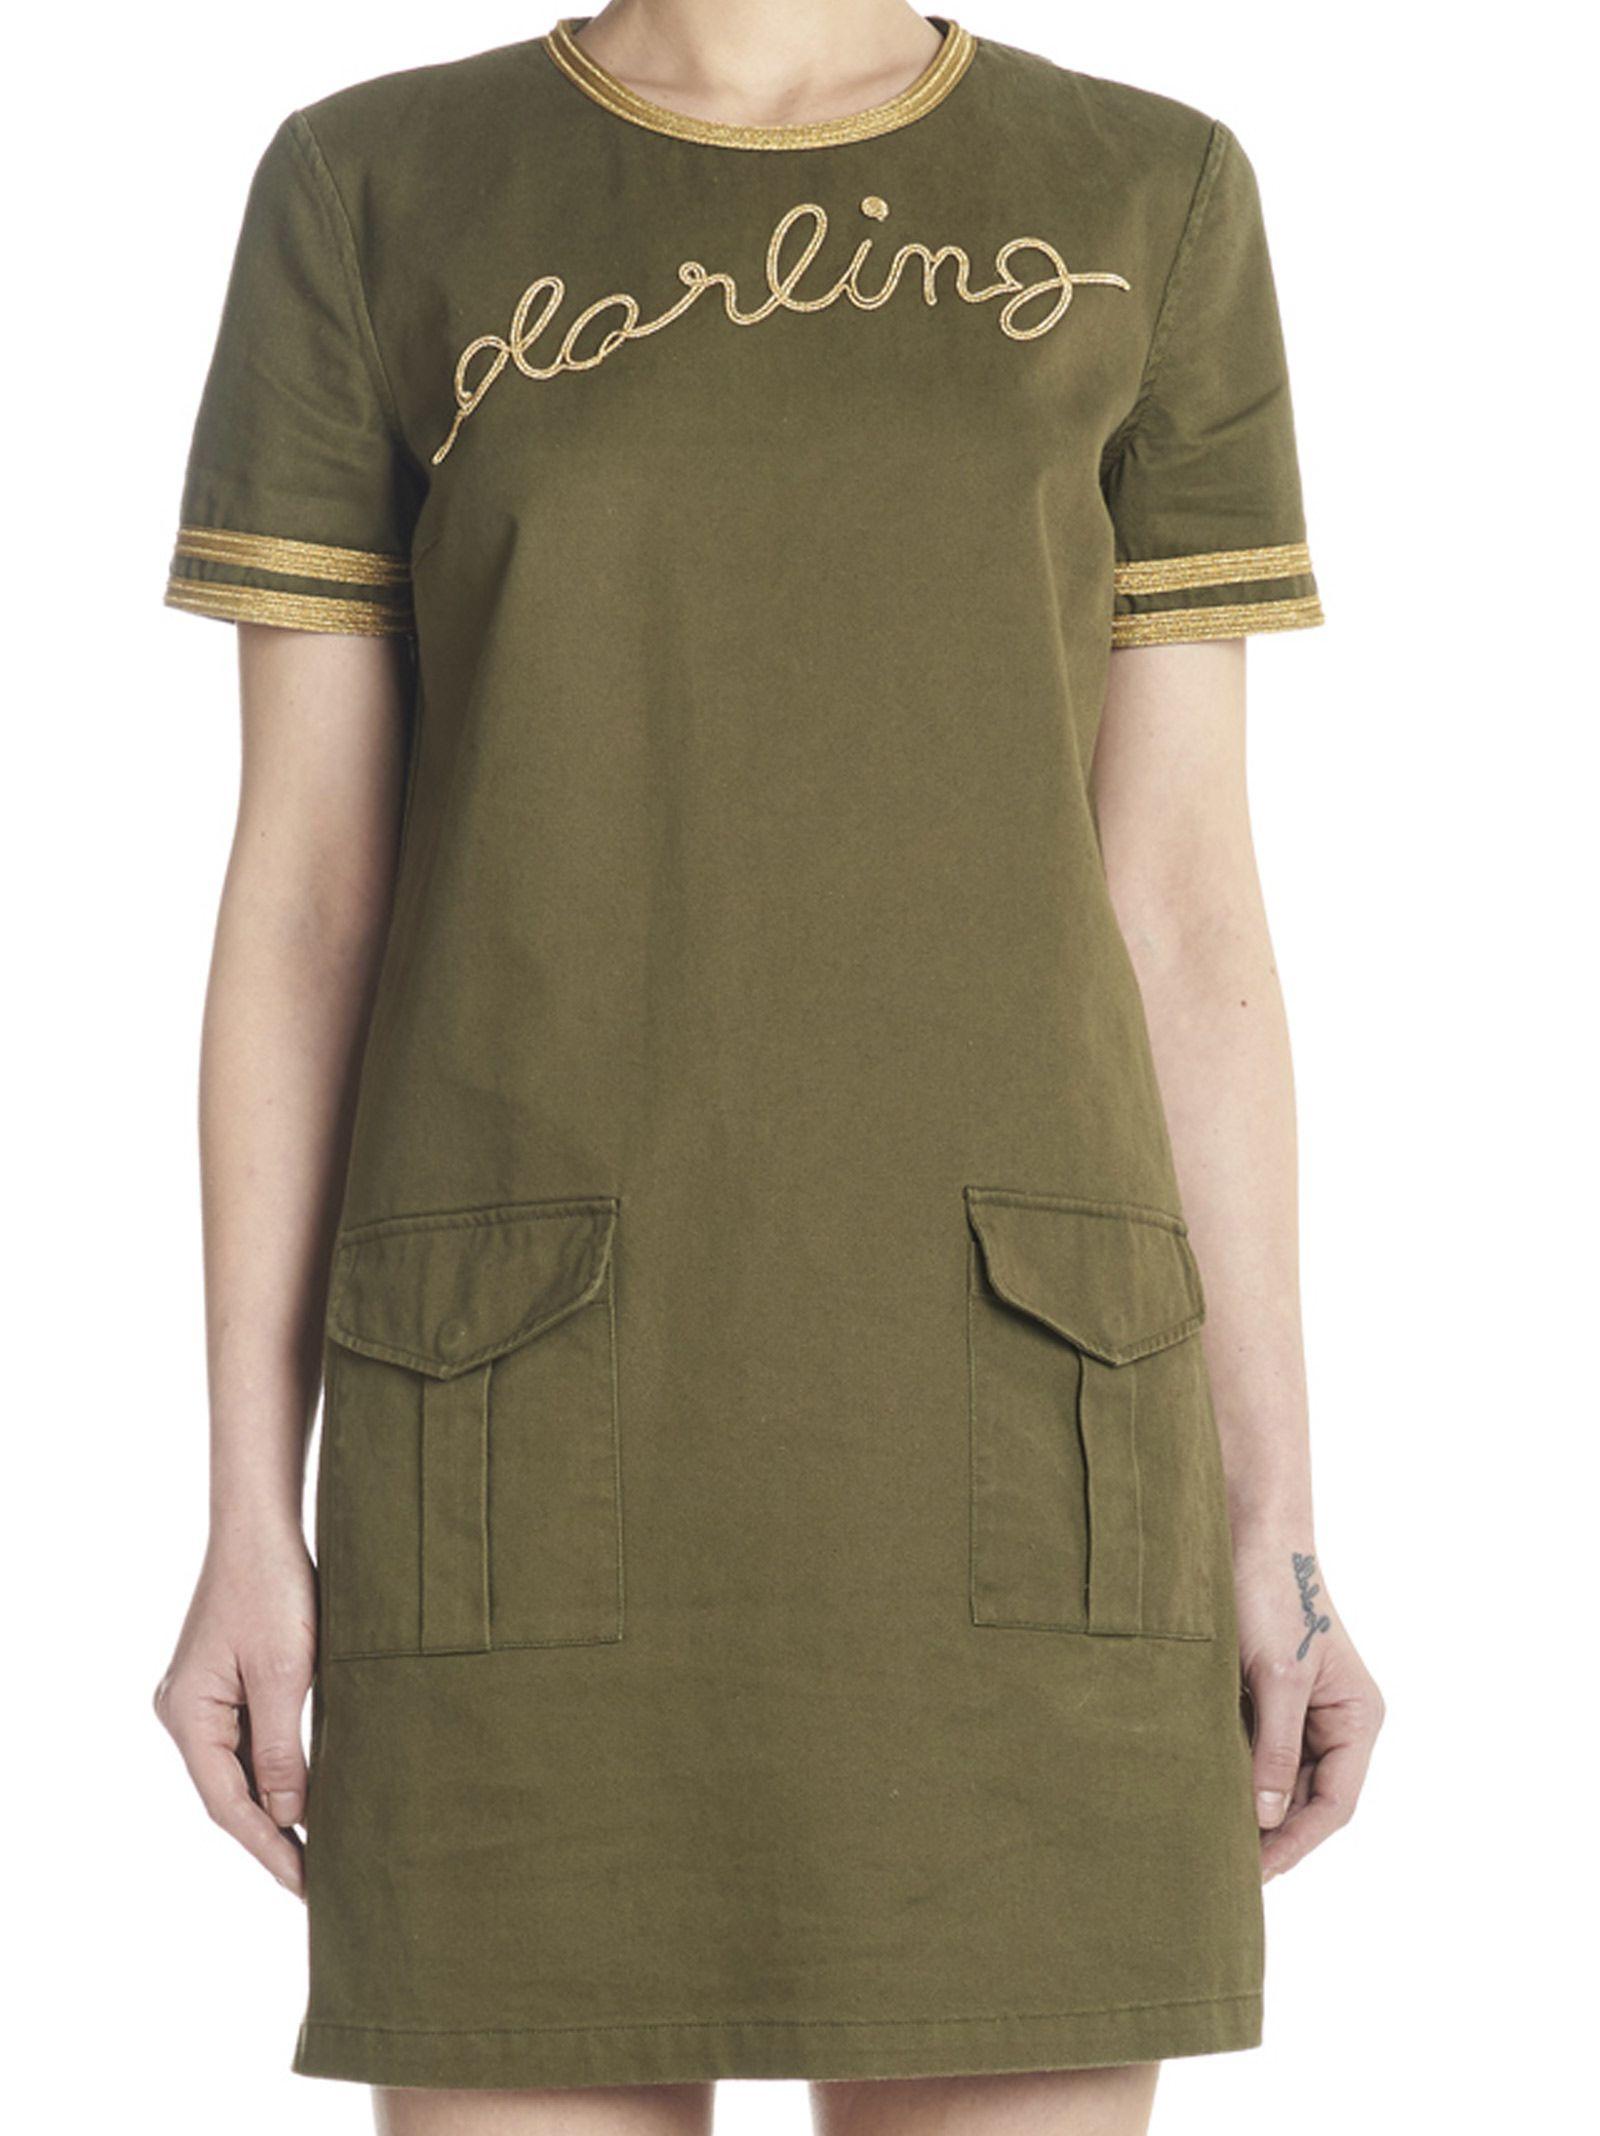 Saint Laurent 'darling' Dress